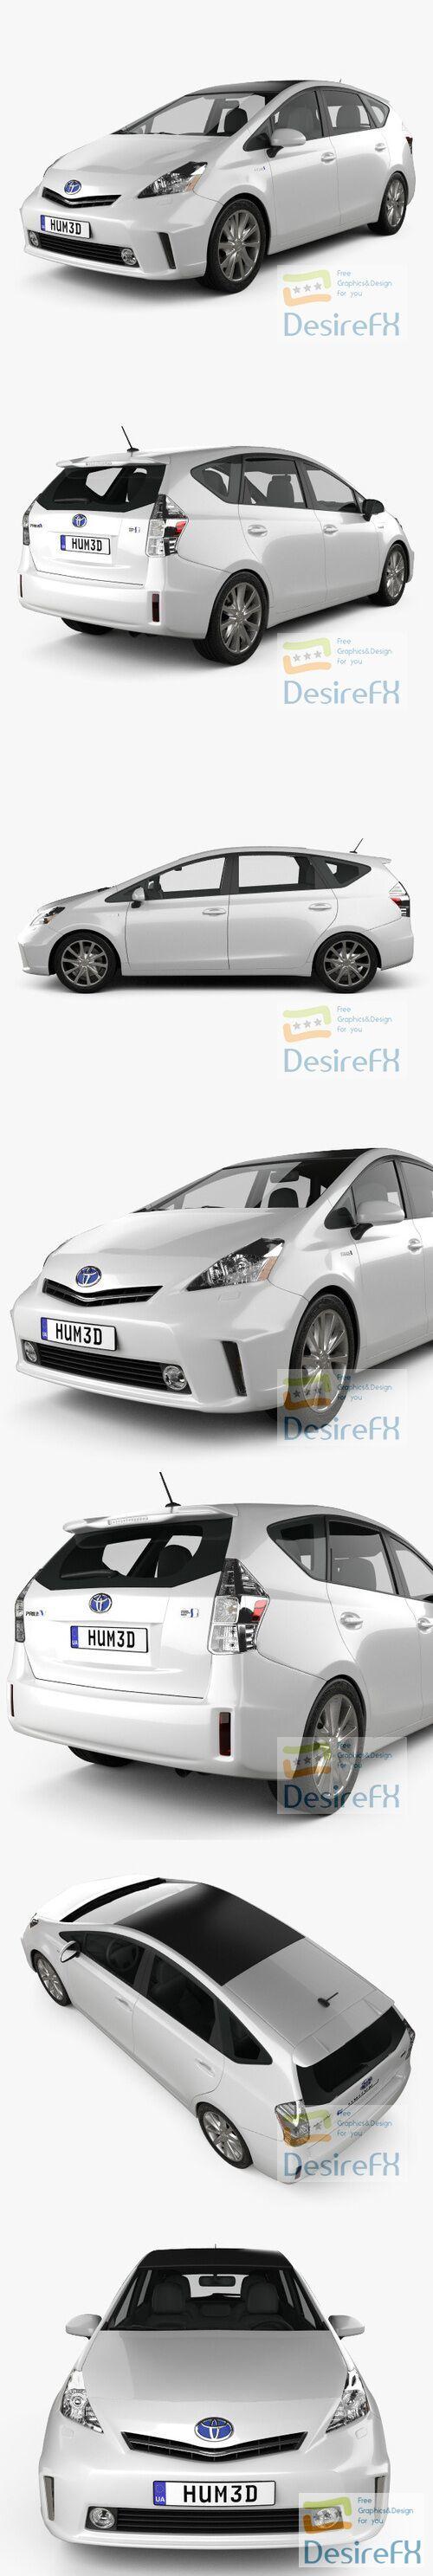 Toyota Prius V 2011 3D Model